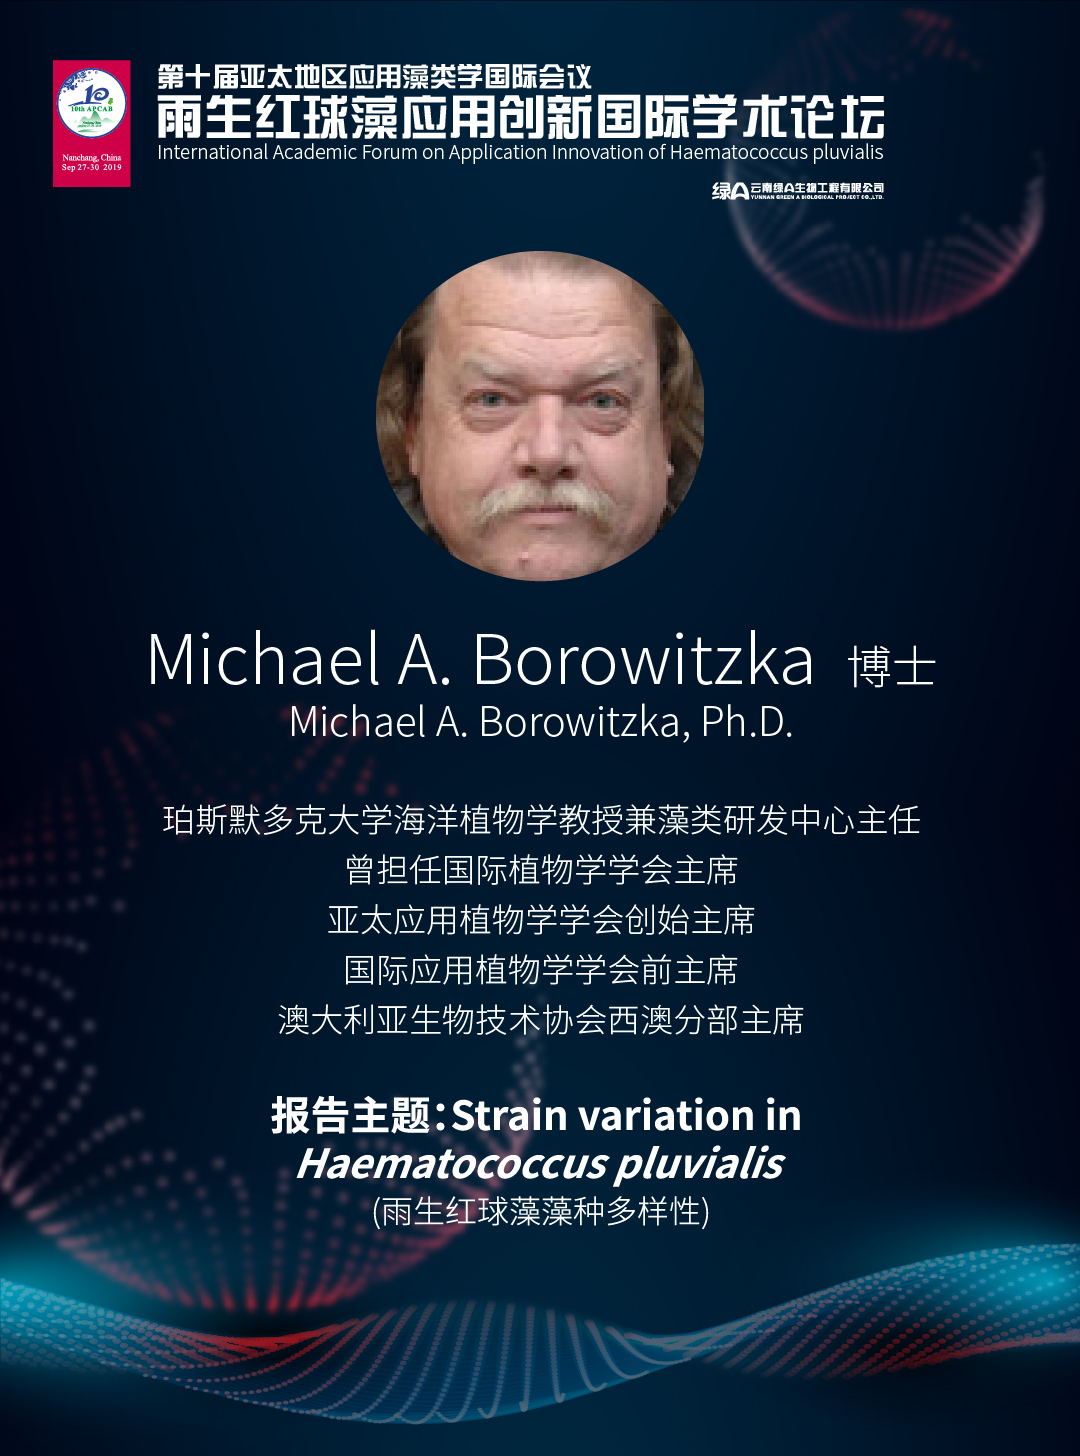 Michael A. Borowitzka 博士 澳大利亚珀斯默多克大学海洋藻类学教授和藻类研发中心主任